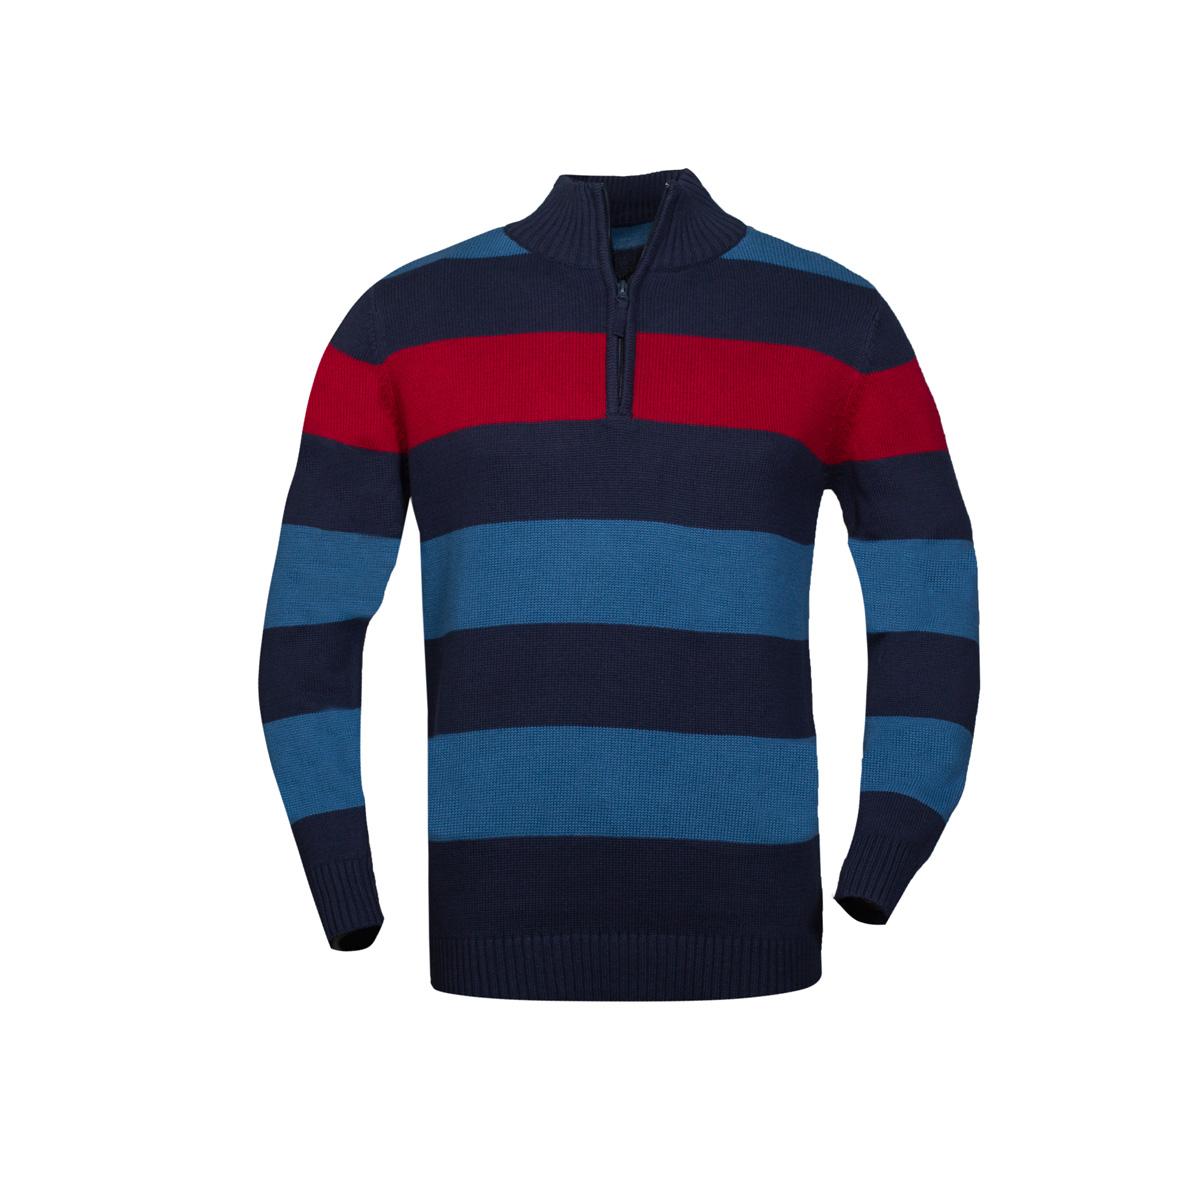 Moški pulover, temno modra